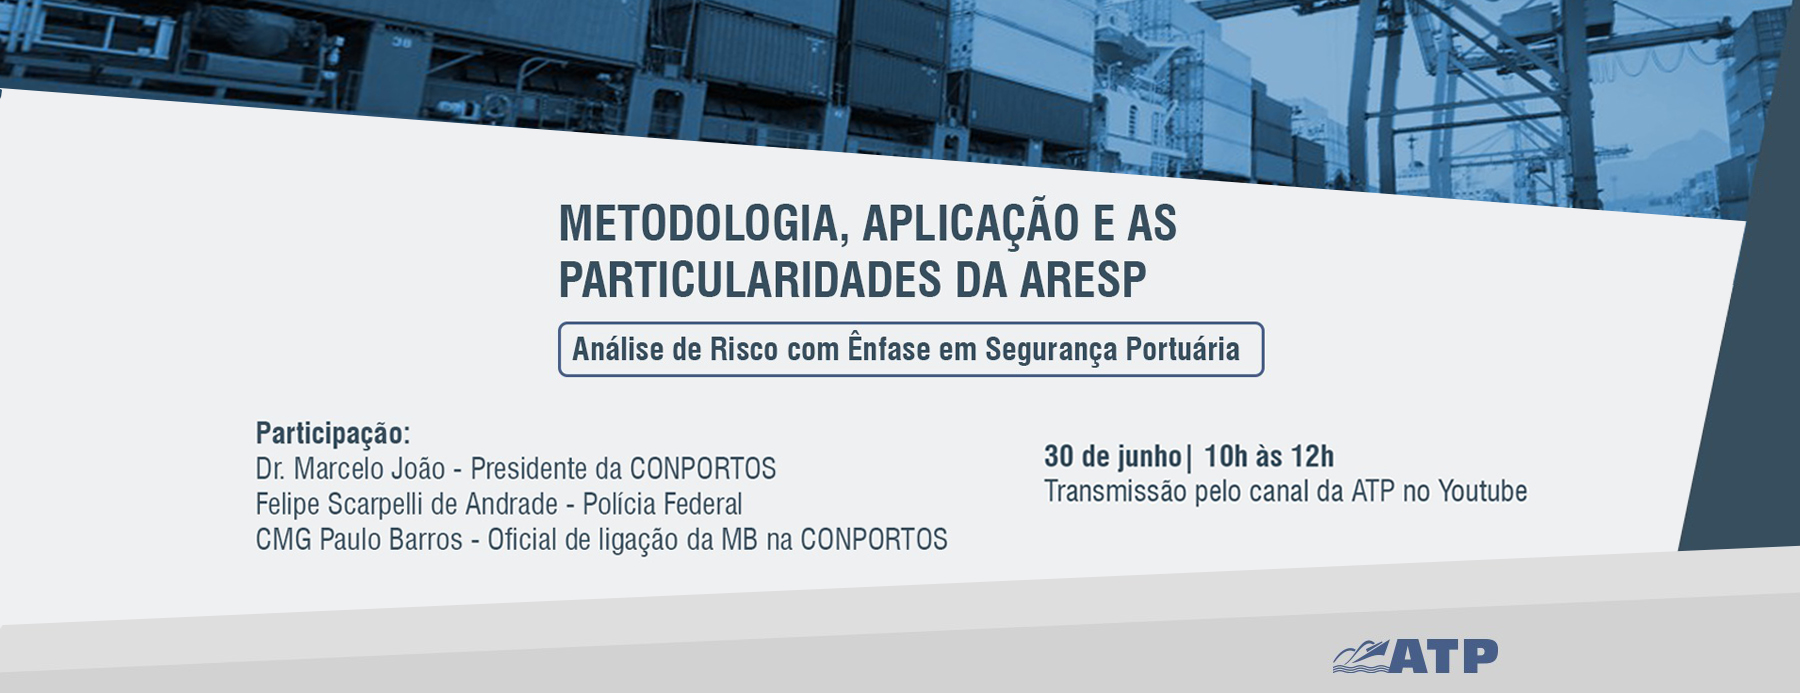 banner_metodologia